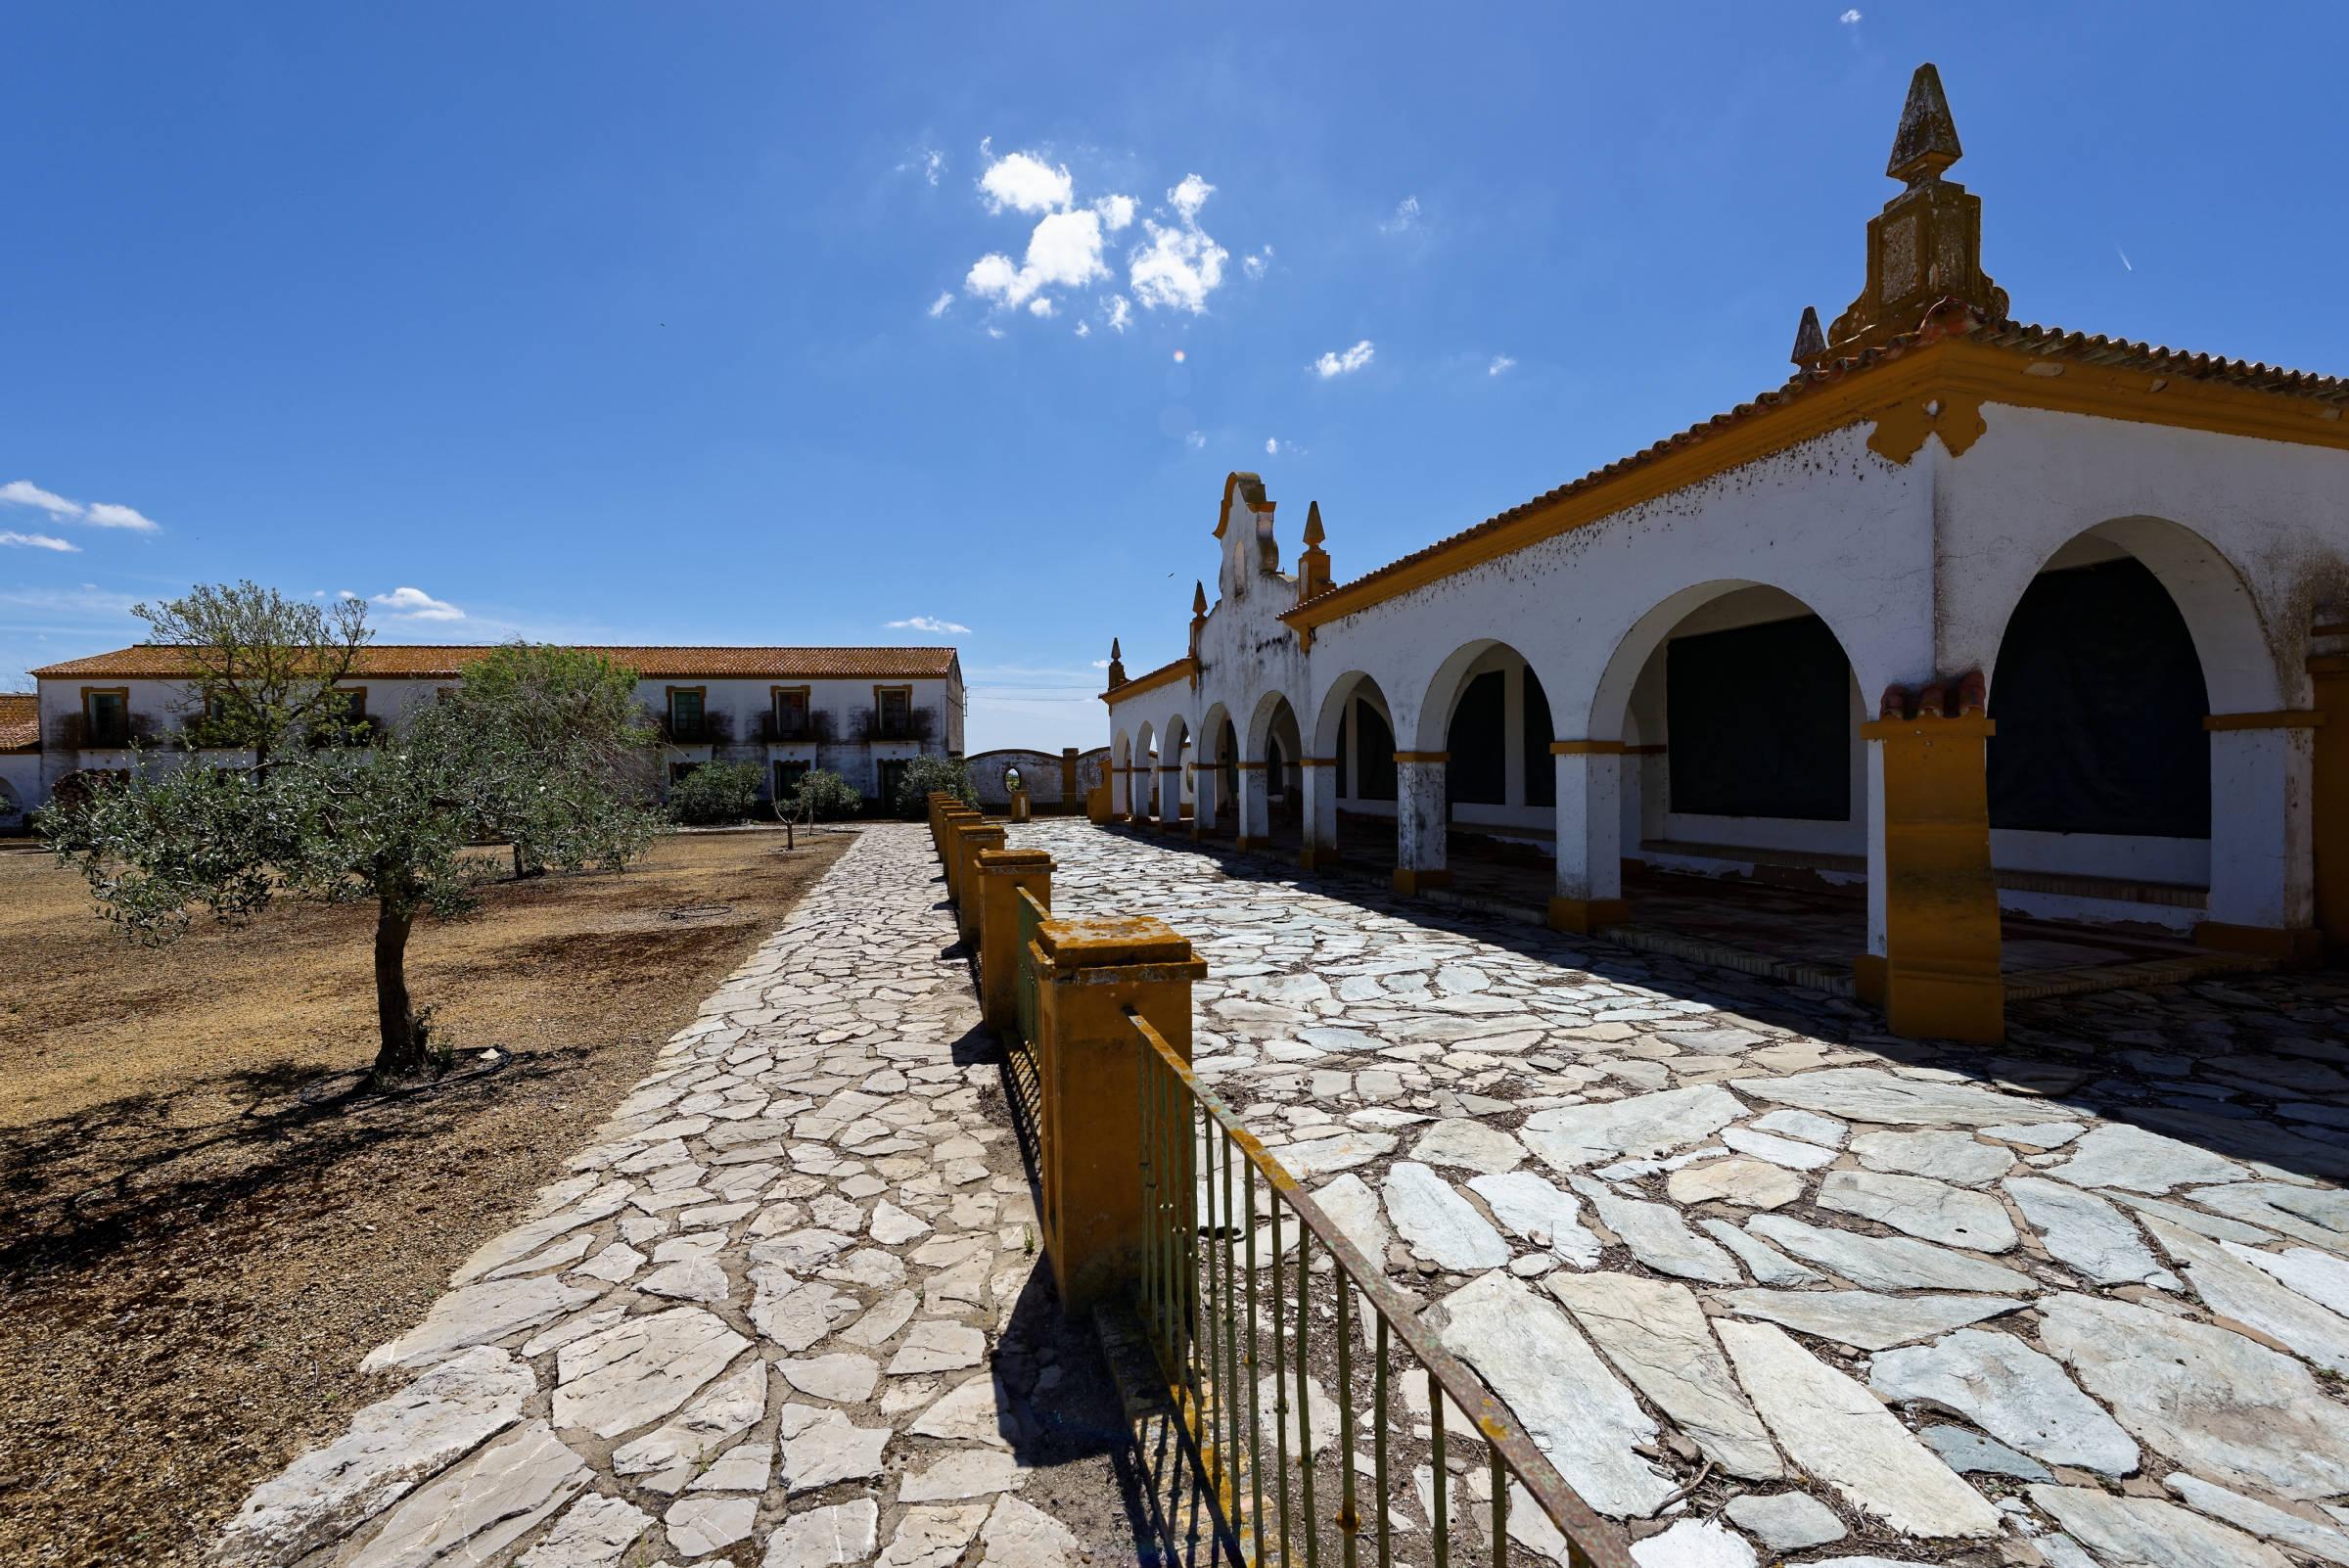 160414-Isla minima - Escobar (Andalousie) (39)